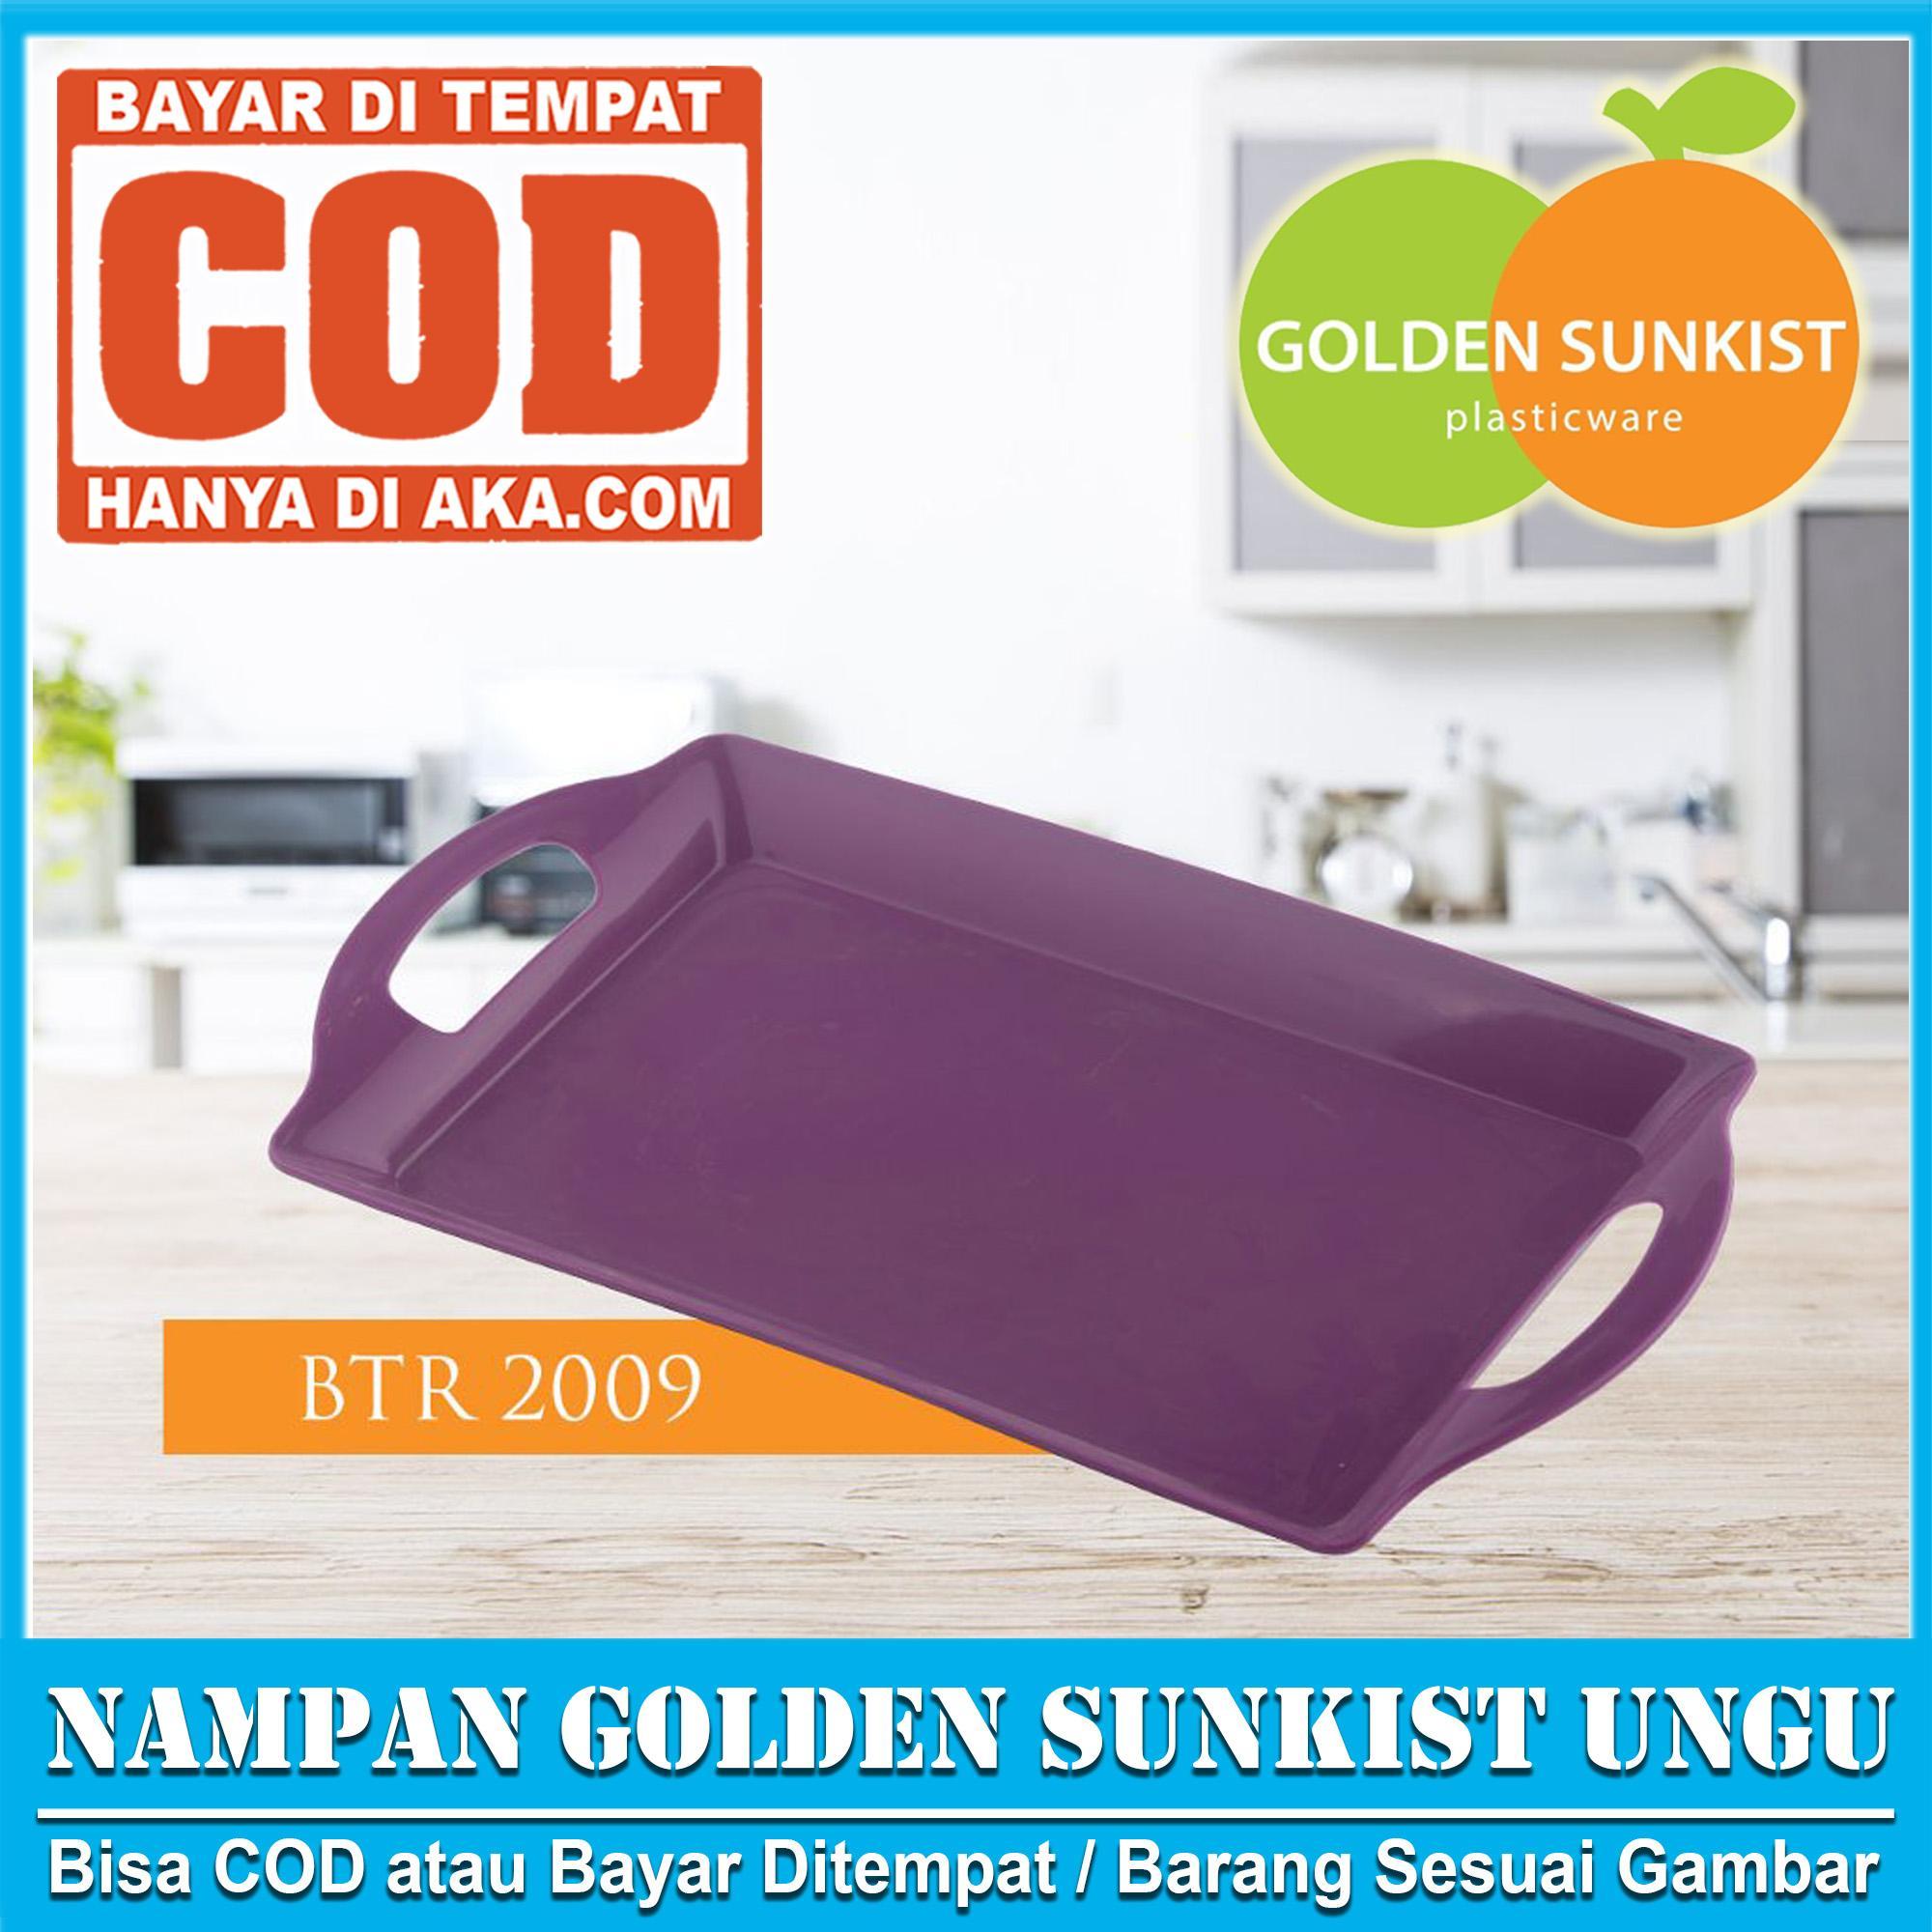 Nampan Baki Golden Sunkist 1pcs BTR 2009 Ukuran 29 X 20 x 3 cm